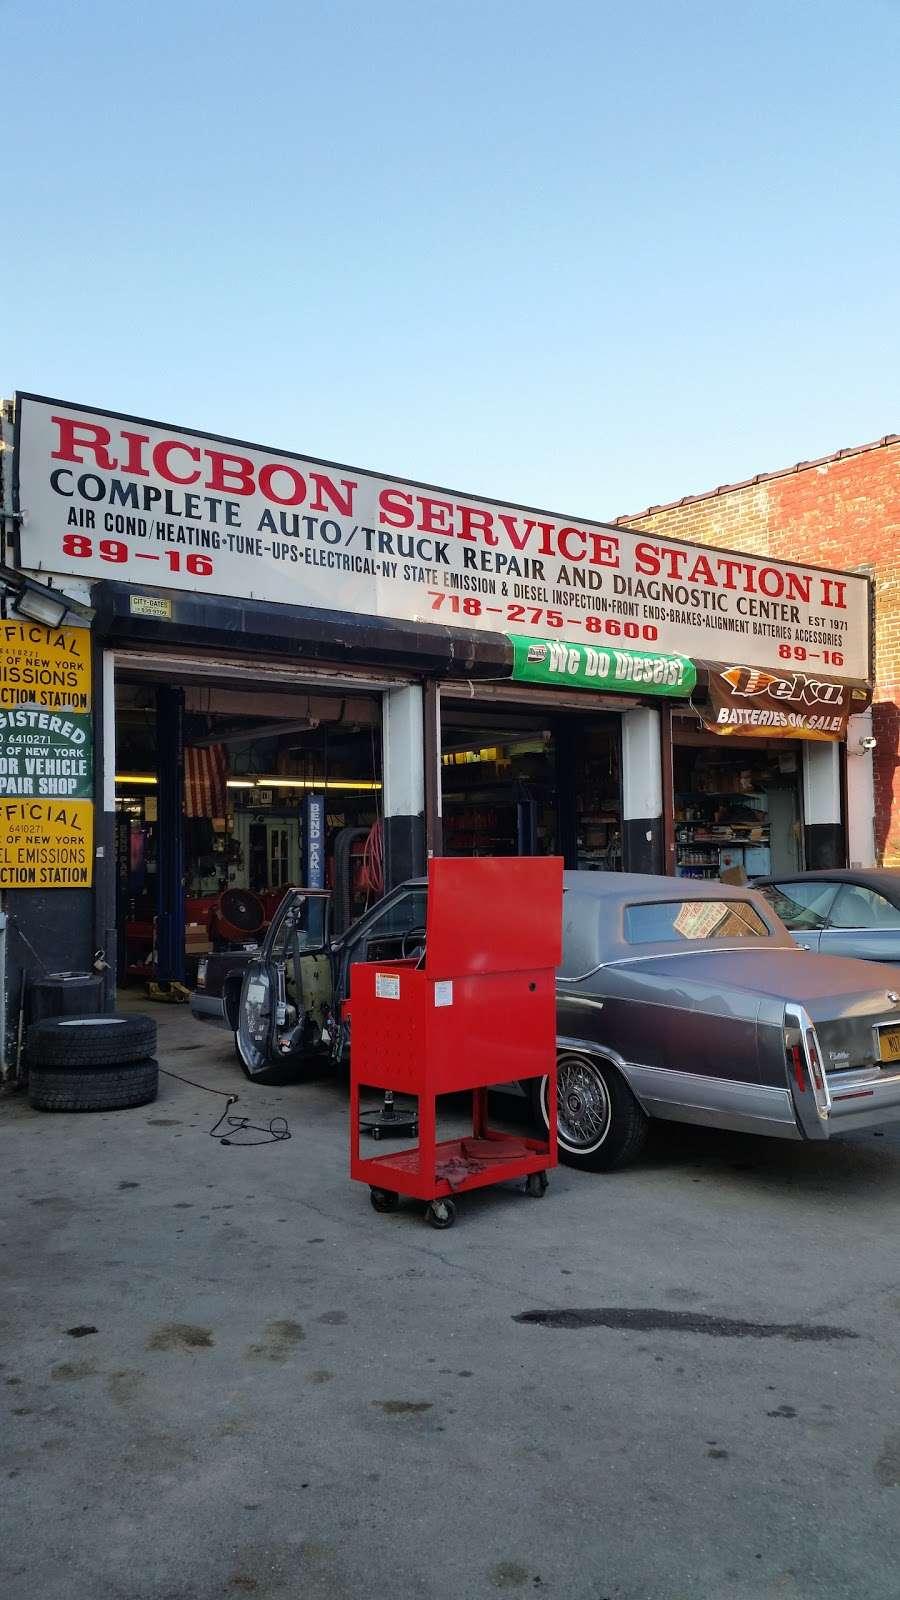 Ricbon Service Station - car repair  | Photo 1 of 2 | Address: 8916 Metropolitan Ave, Flushing, NY 11374, USA | Phone: (718) 275-8600